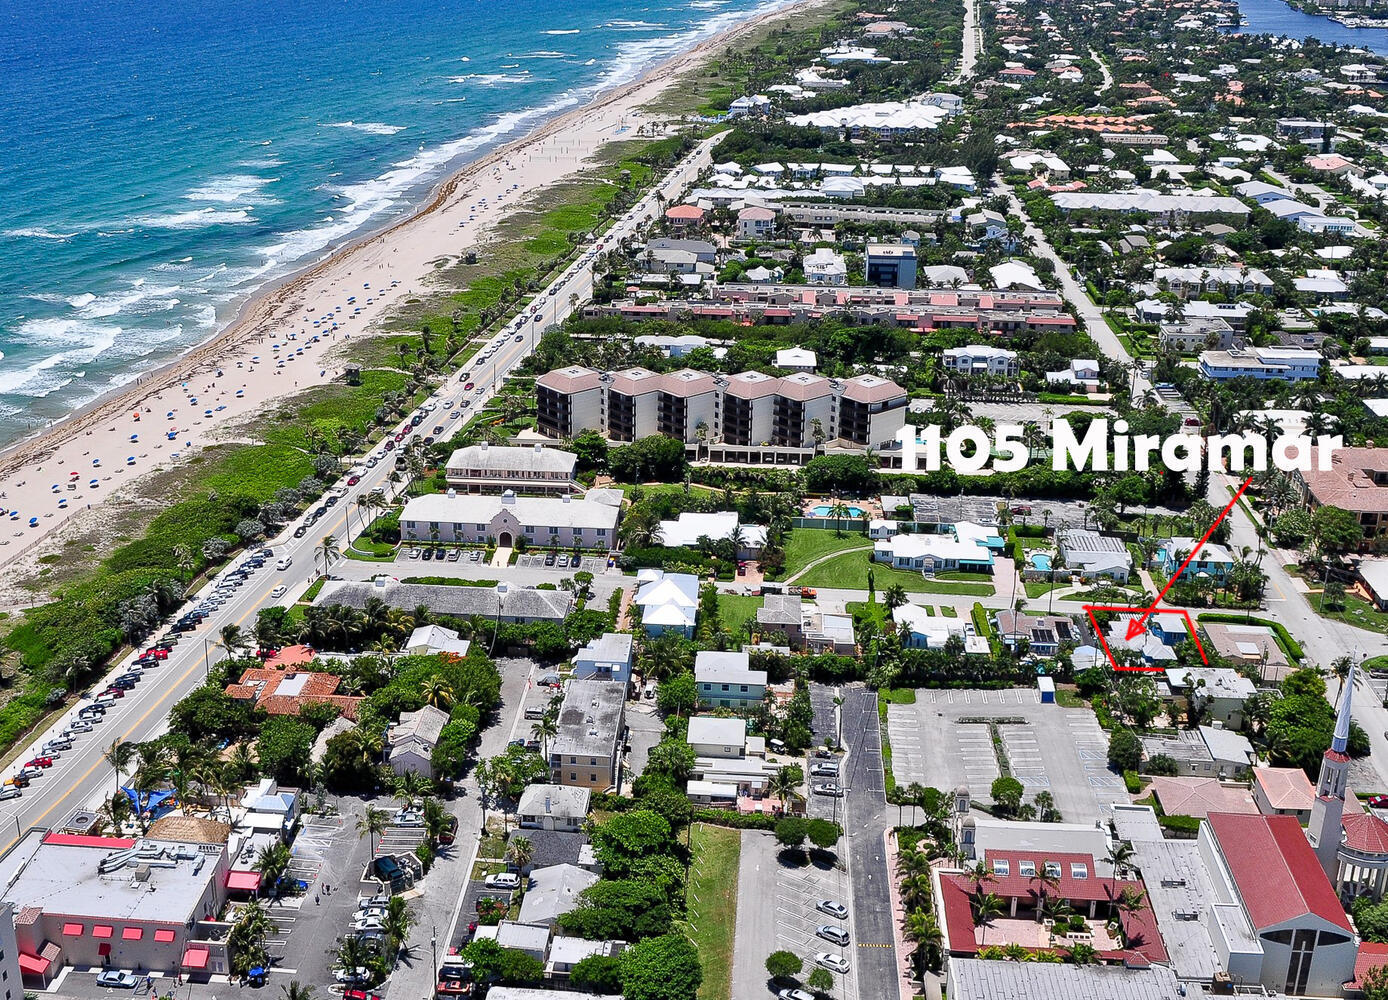 1105 Miramar Drive, Delray Beach, Florida 33483, 5 Bedrooms Bedrooms, ,3.1 BathroomsBathrooms,Single Family Detached,For Sale,Miramar,RX-10568577